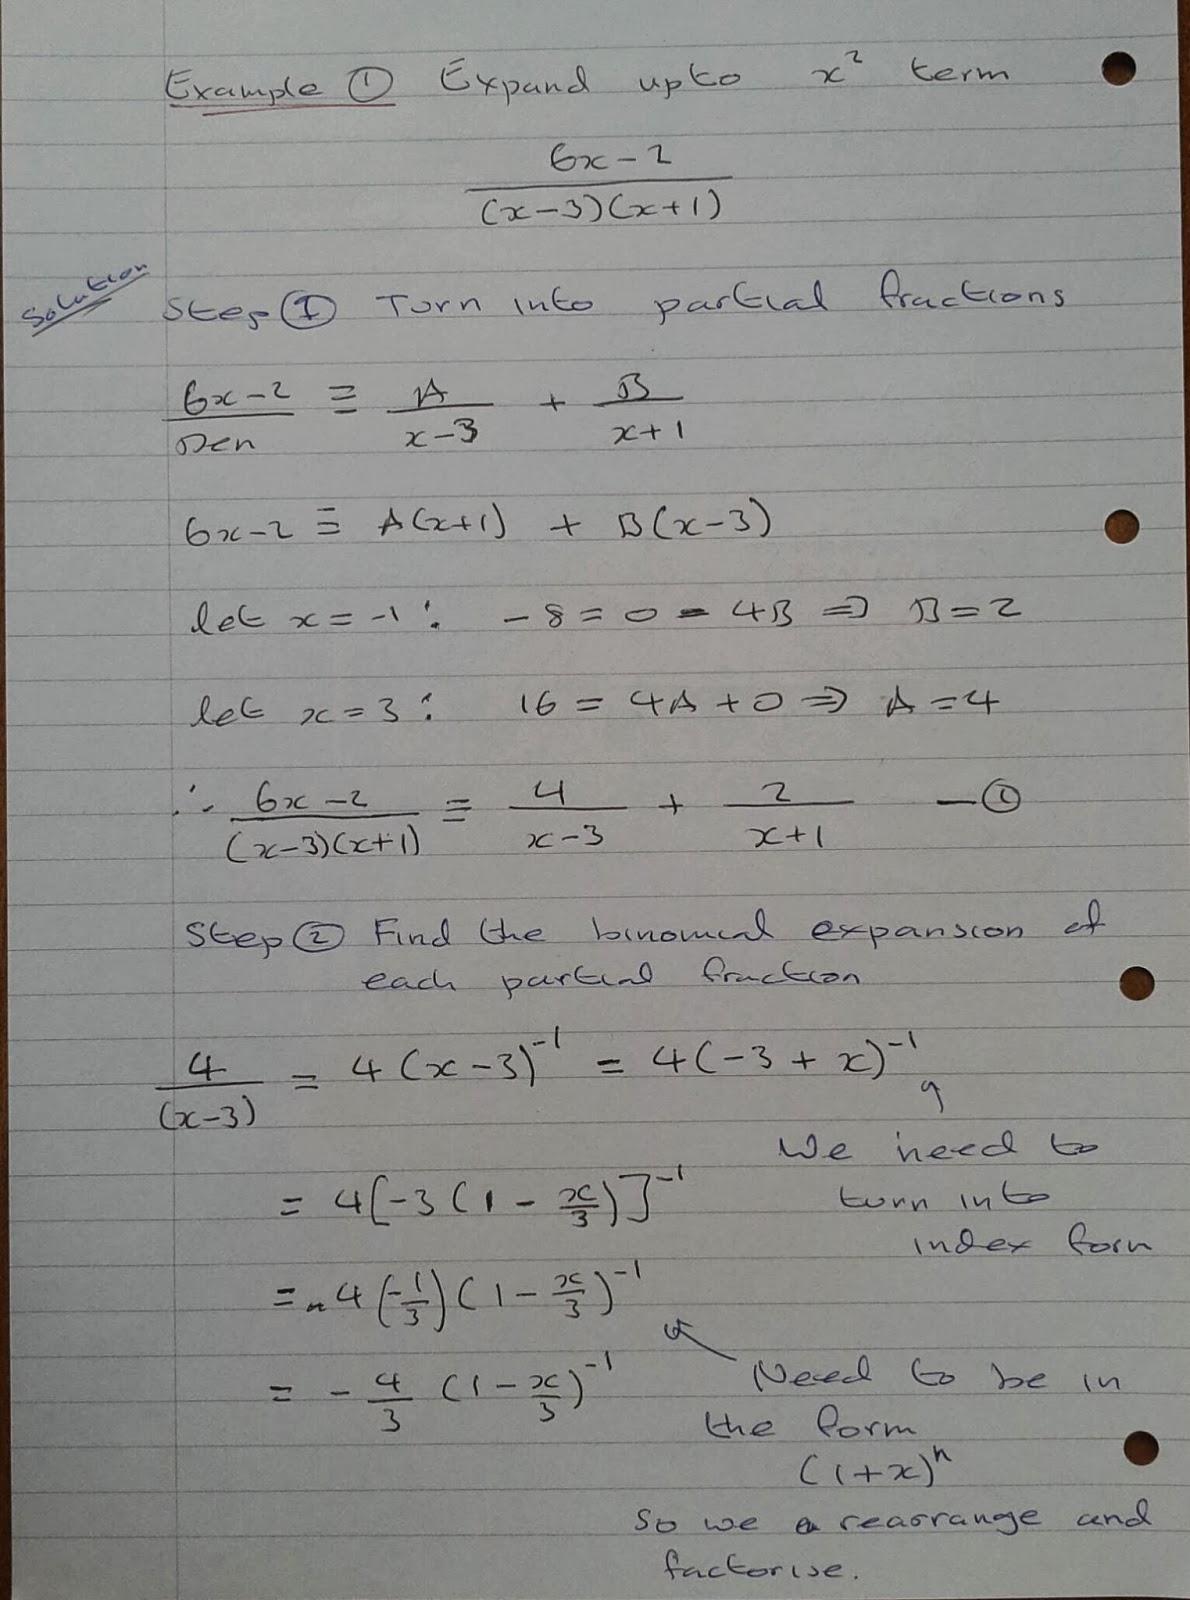 math worksheet : mathematics year 5 fractions notes  educational math activities : Partial Fractions Worksheet